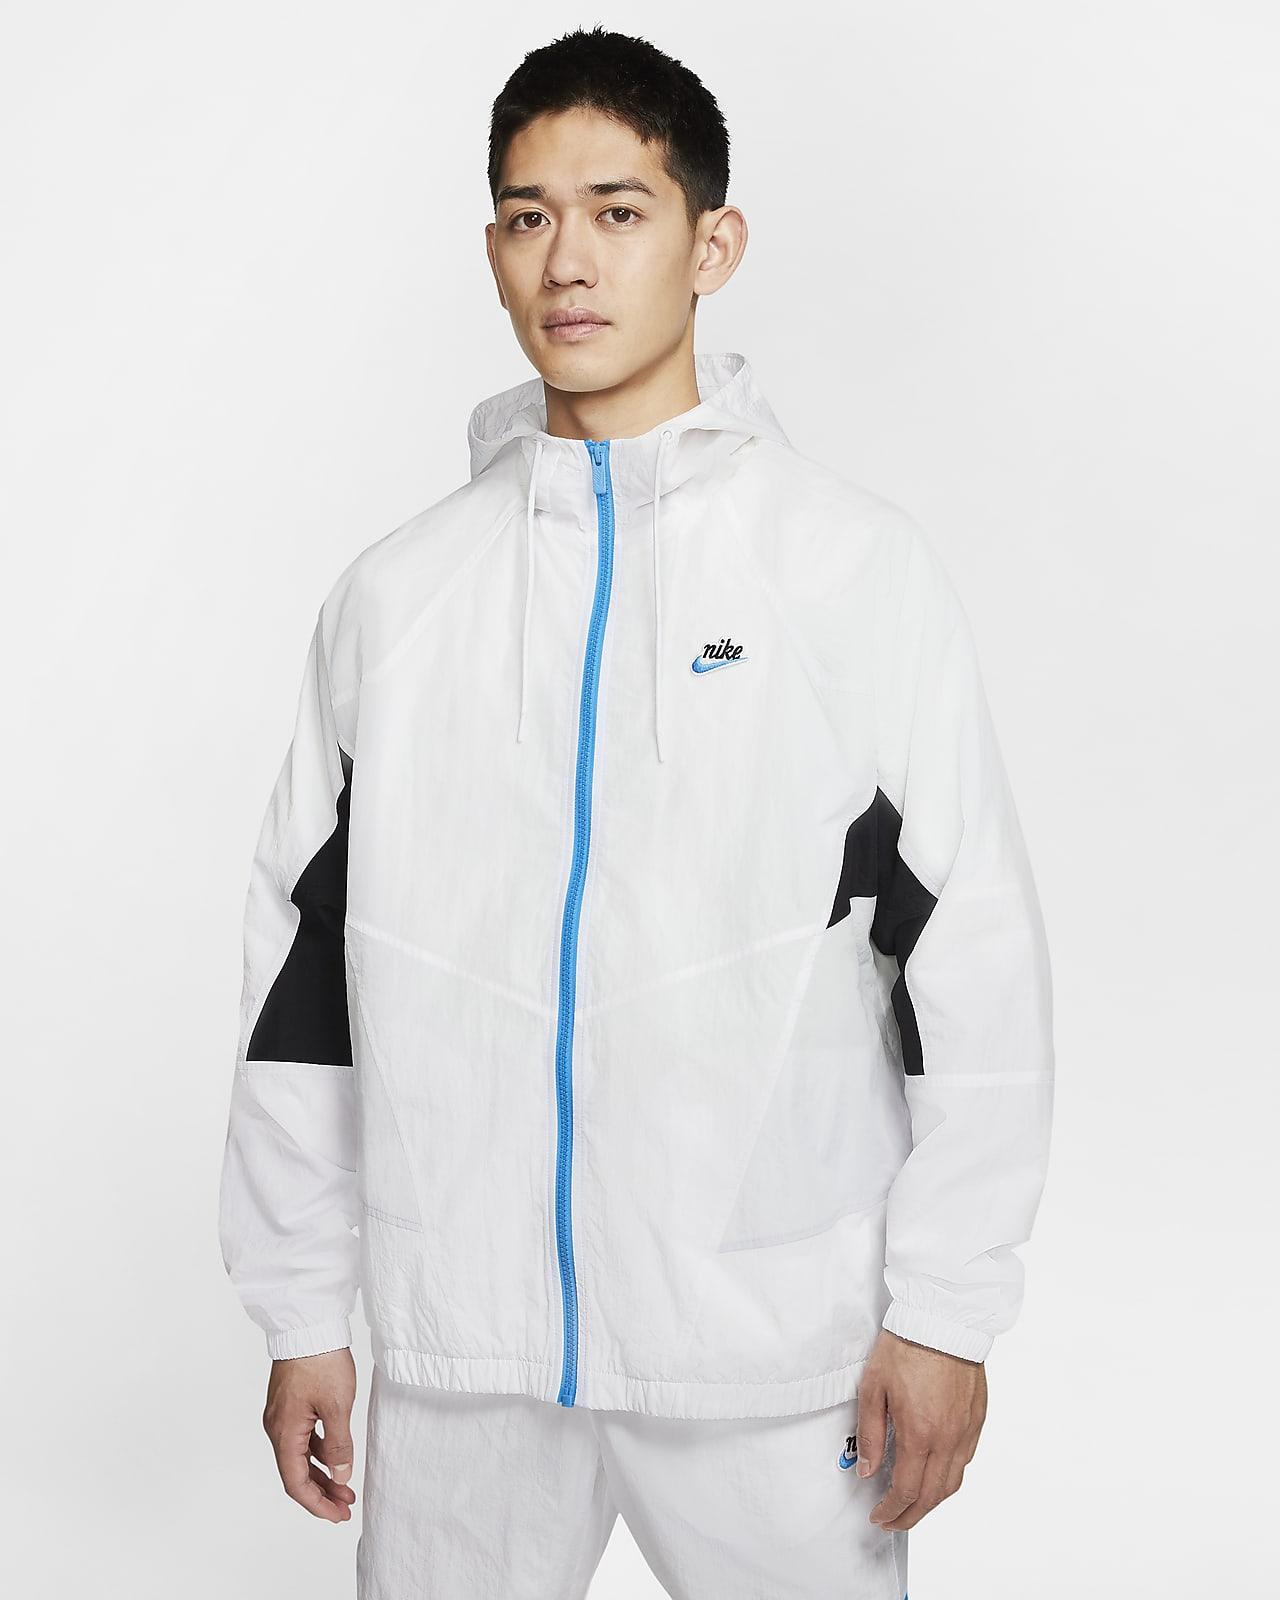 Casaco de assinatura Nike Sportswear Heritage Windrunner